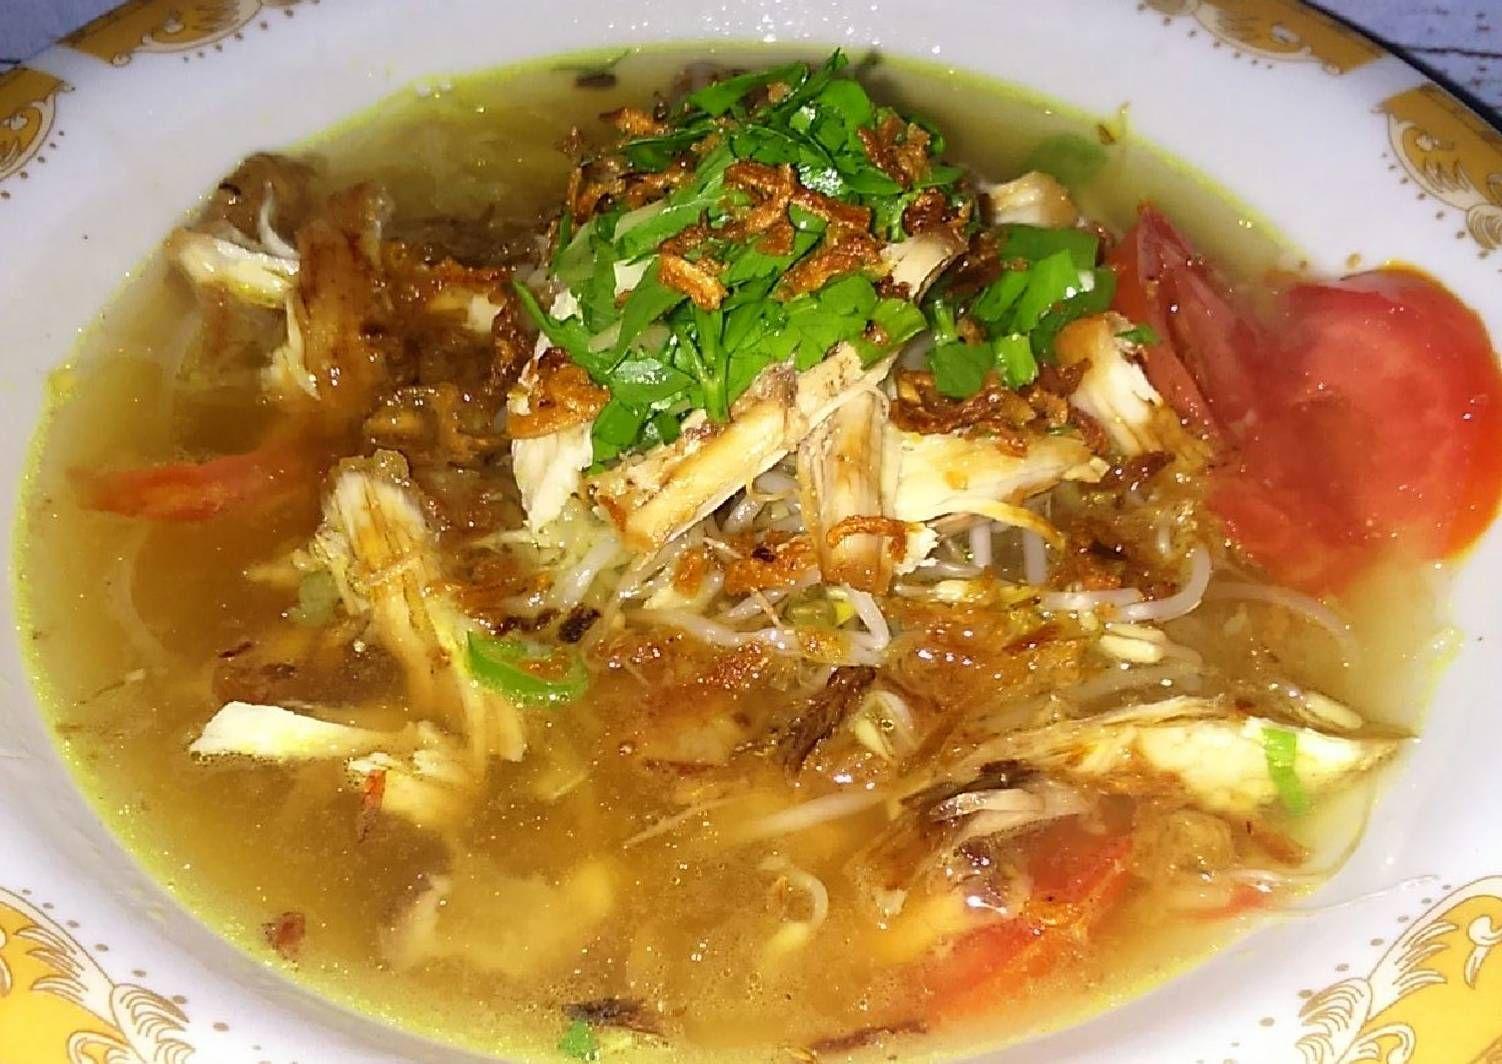 Resep Soto Ayam Kuah Bening Oleh Mellmell Resep Makanan Dan Minuman Resep Masakan Indonesia Resep Masakan